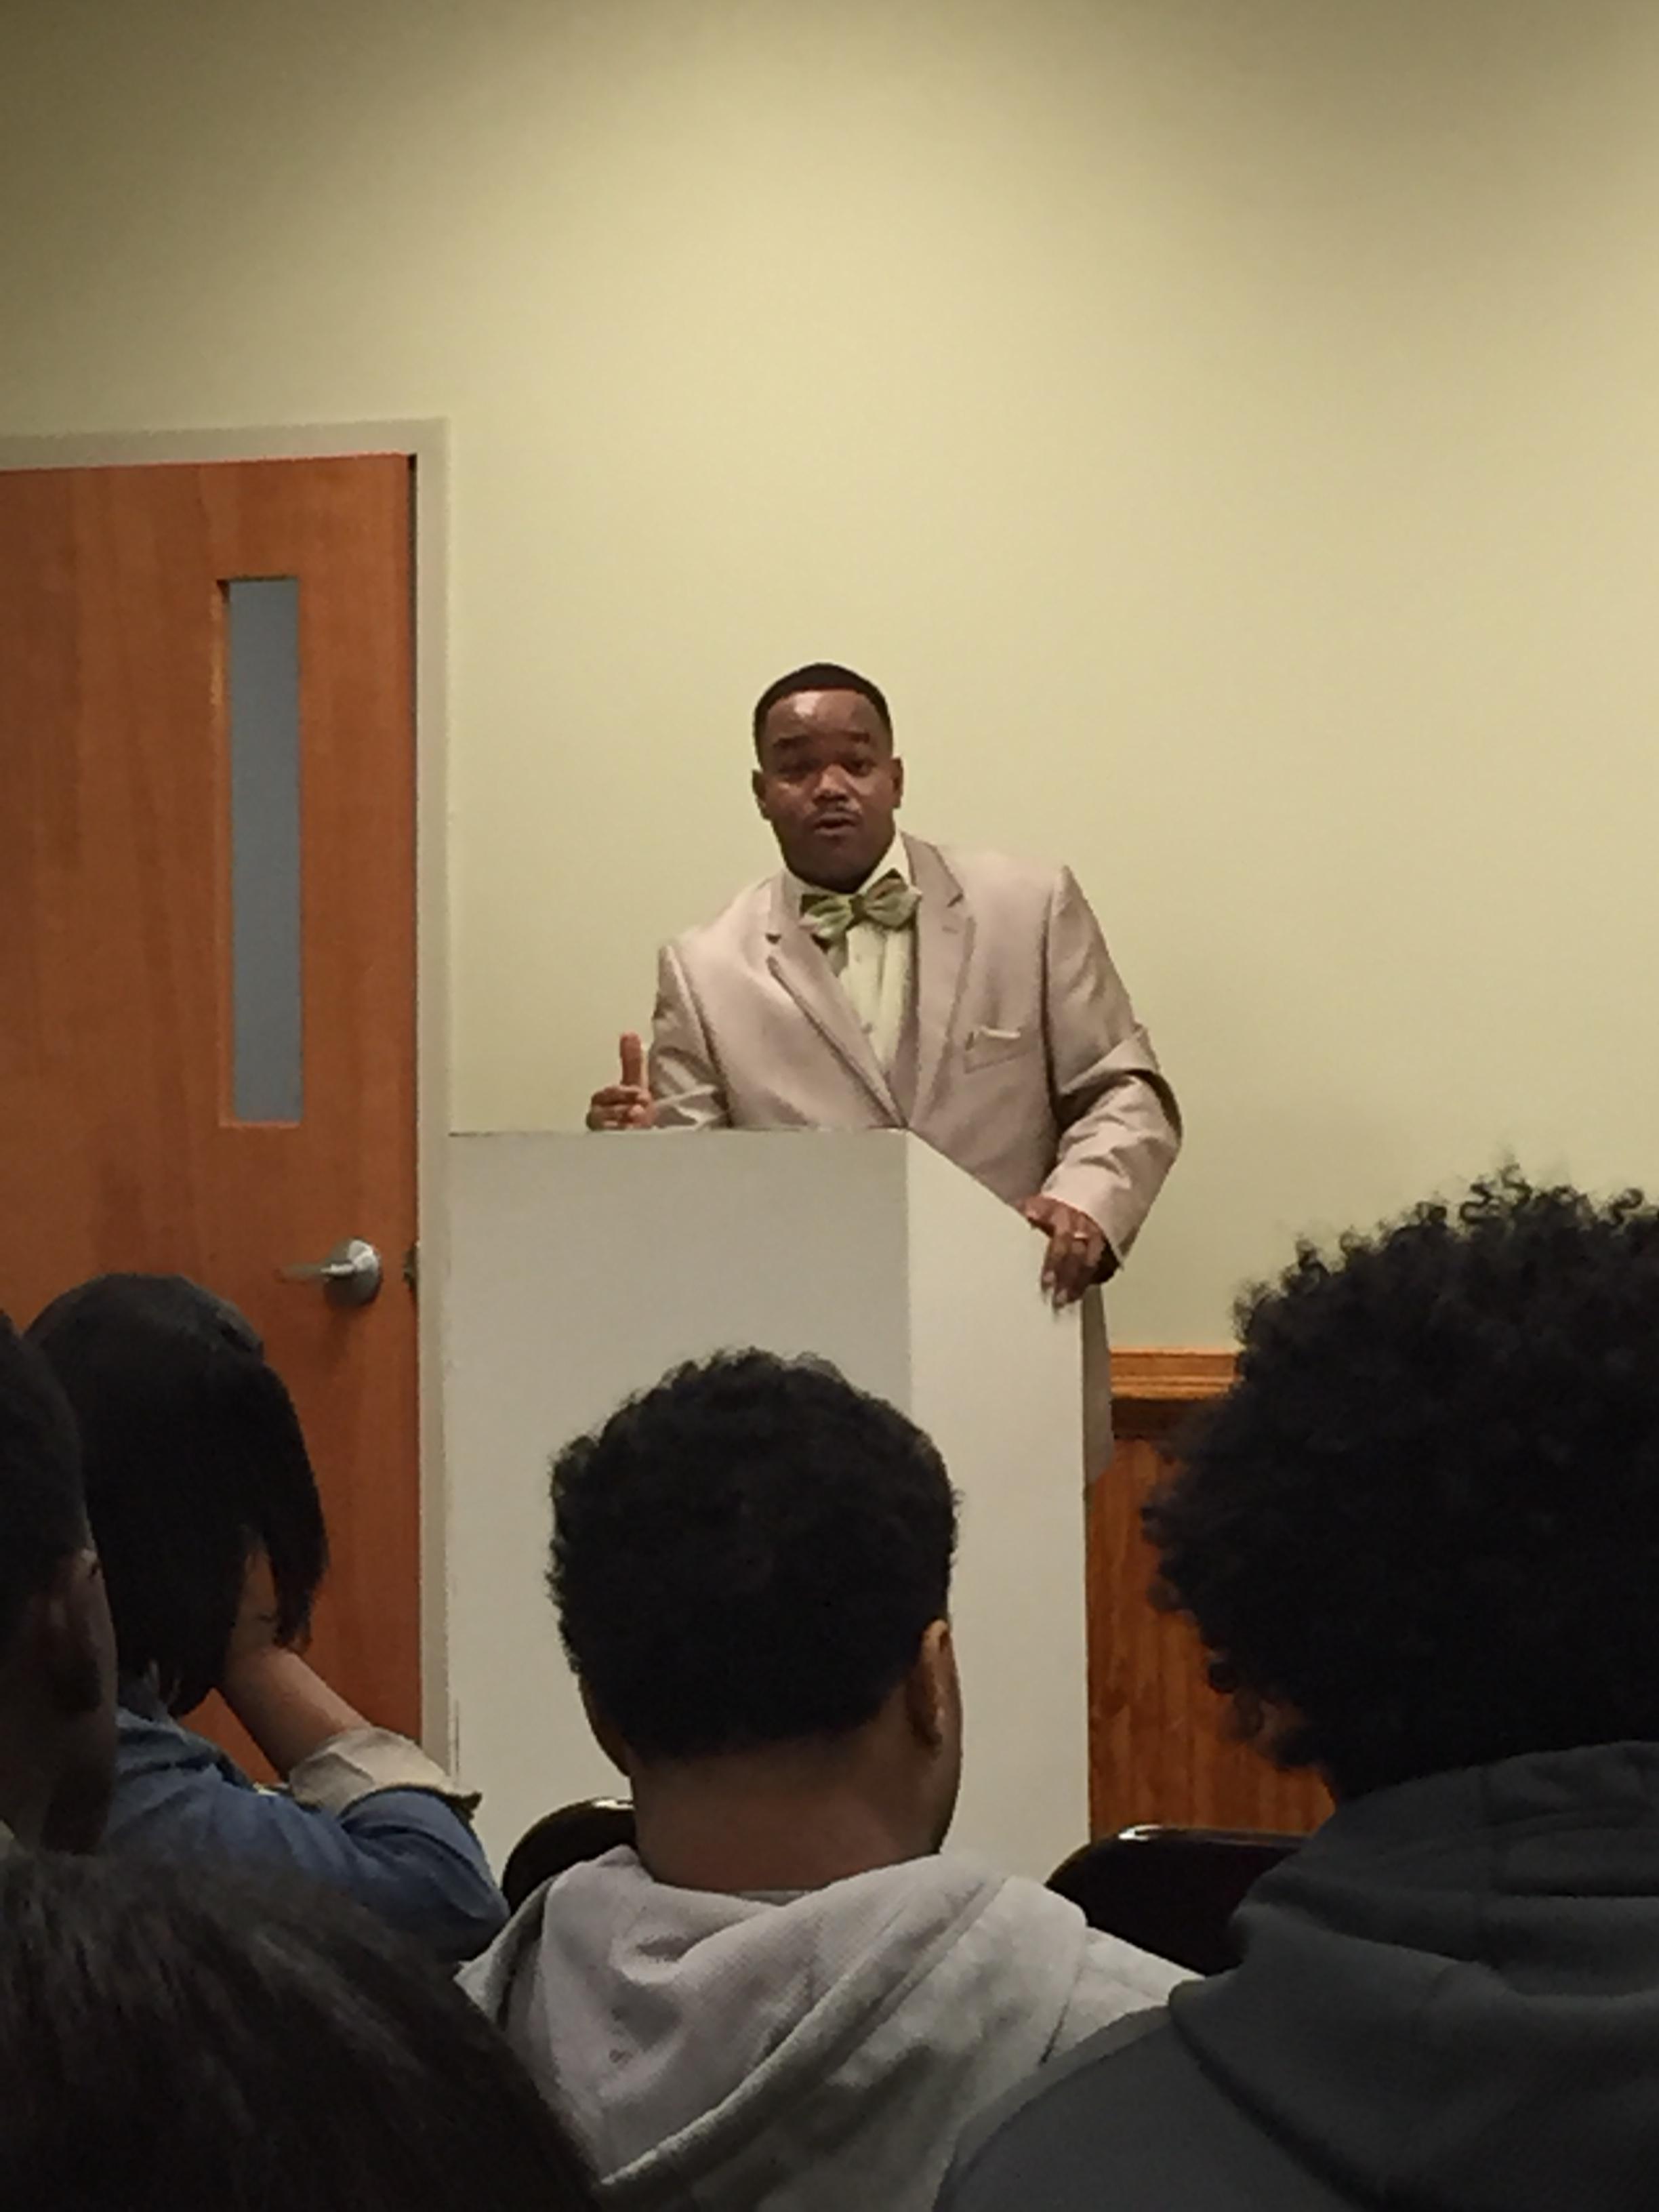 Deputy Dotton Speaks to the Youth